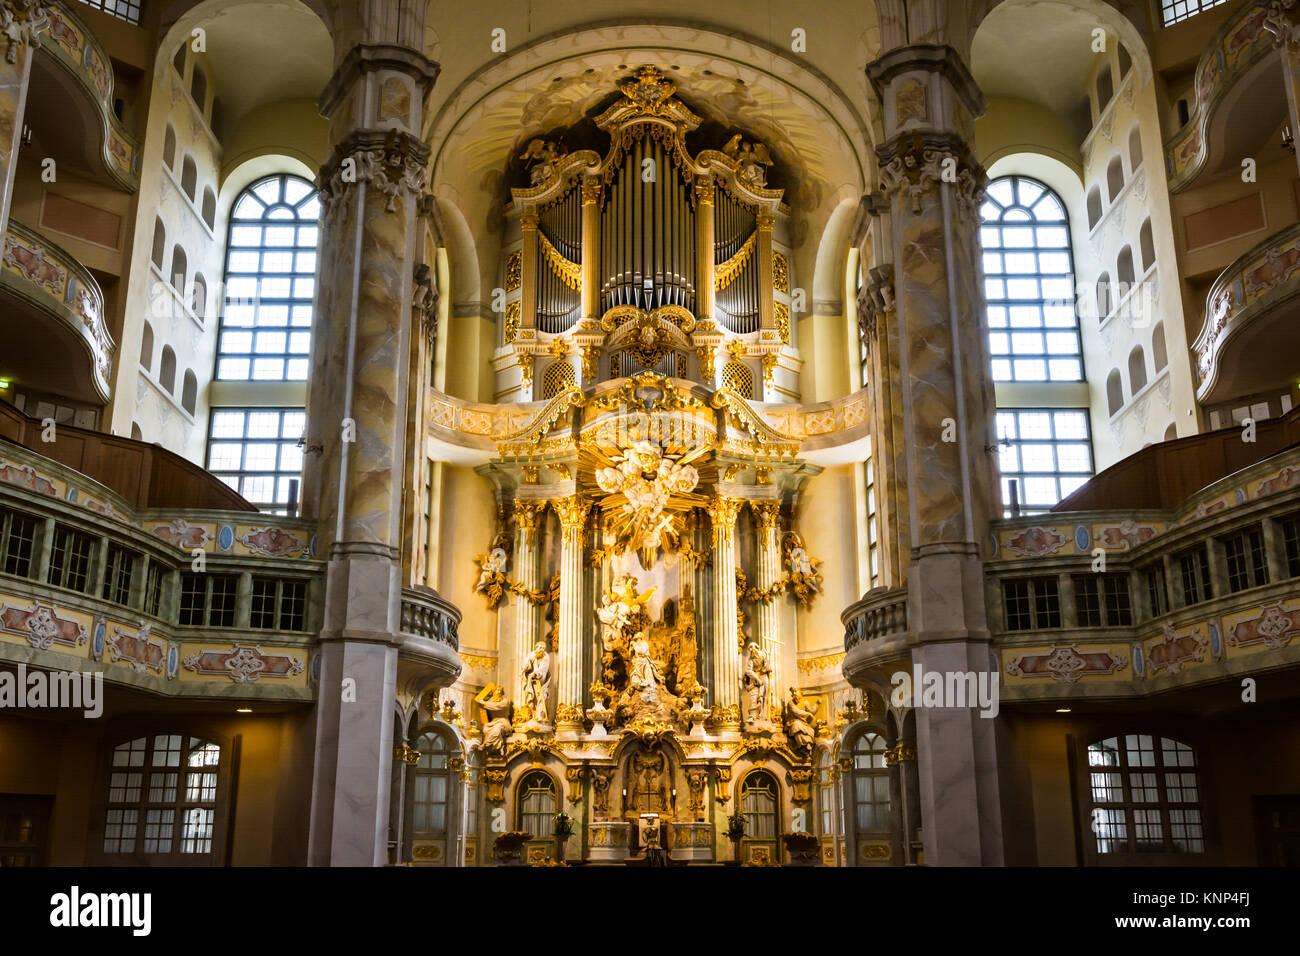 Dresdner Frauenkirche Innenarchitektur kunstvoller Dekoration Religion Altar Anbetung Bereich Stockbild